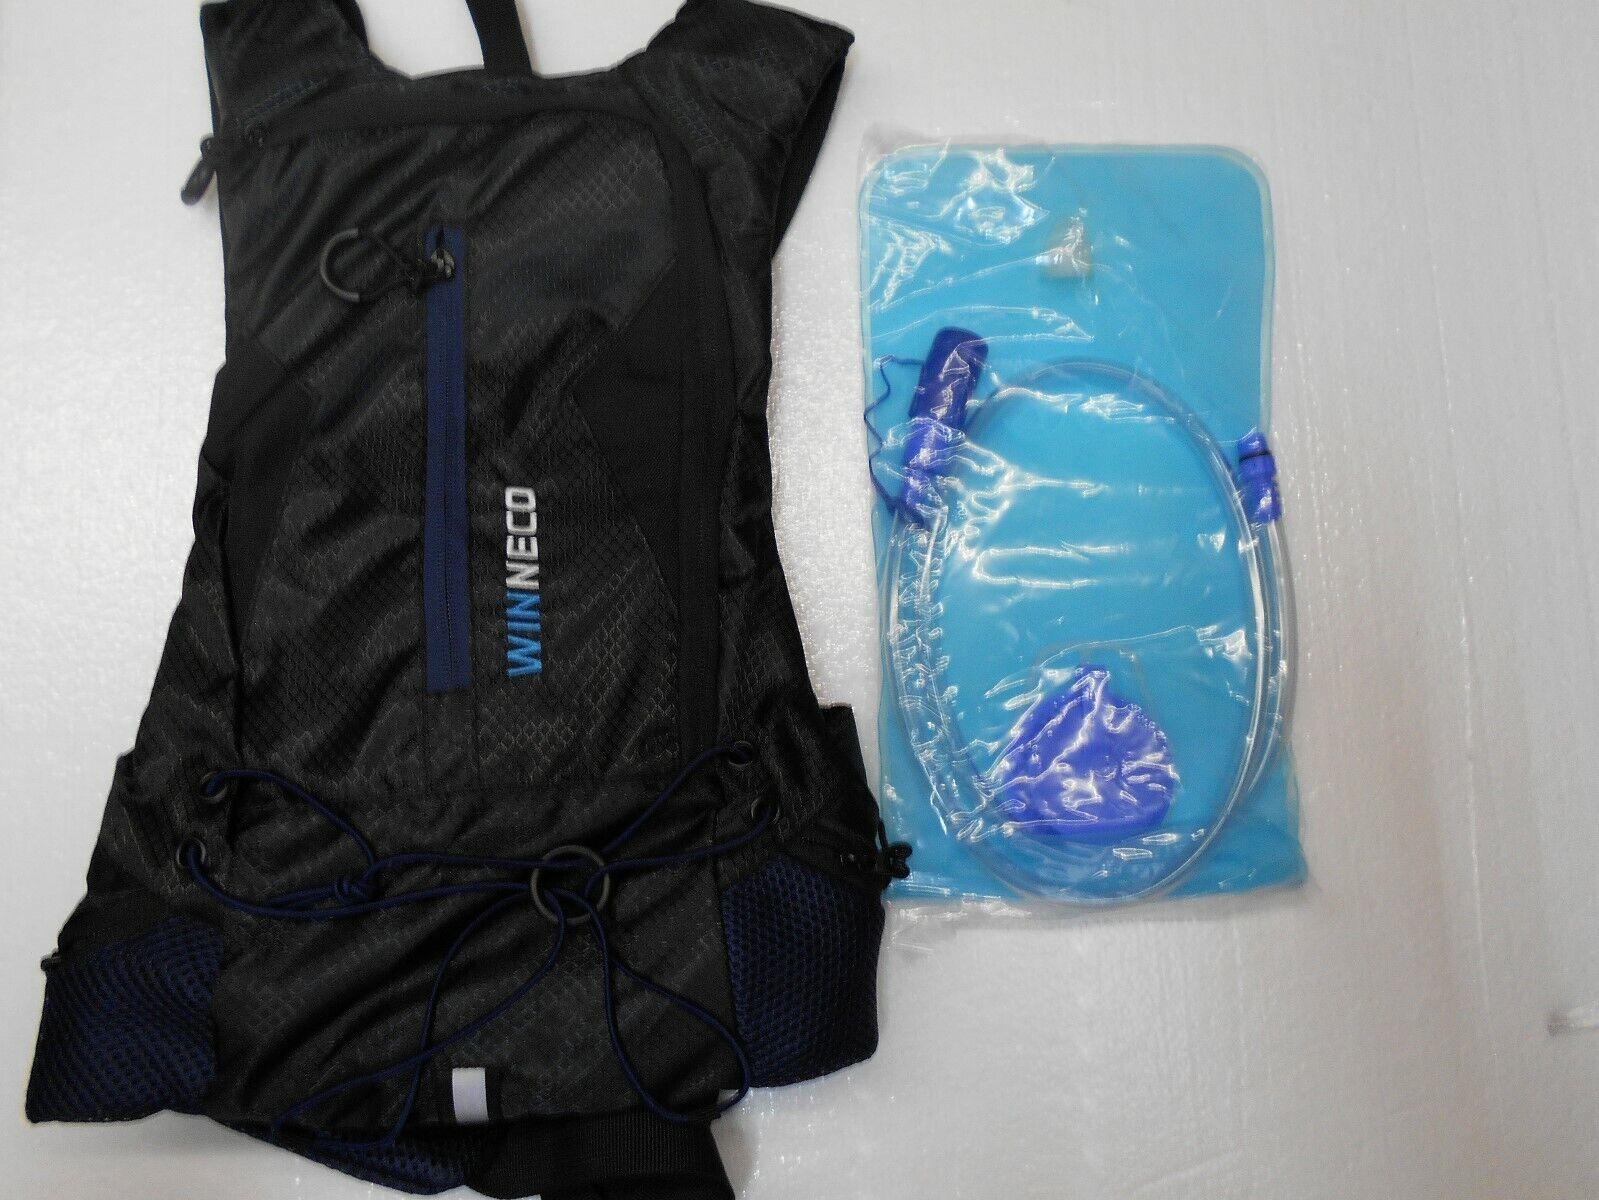 hydration pack for running walking hiking biking